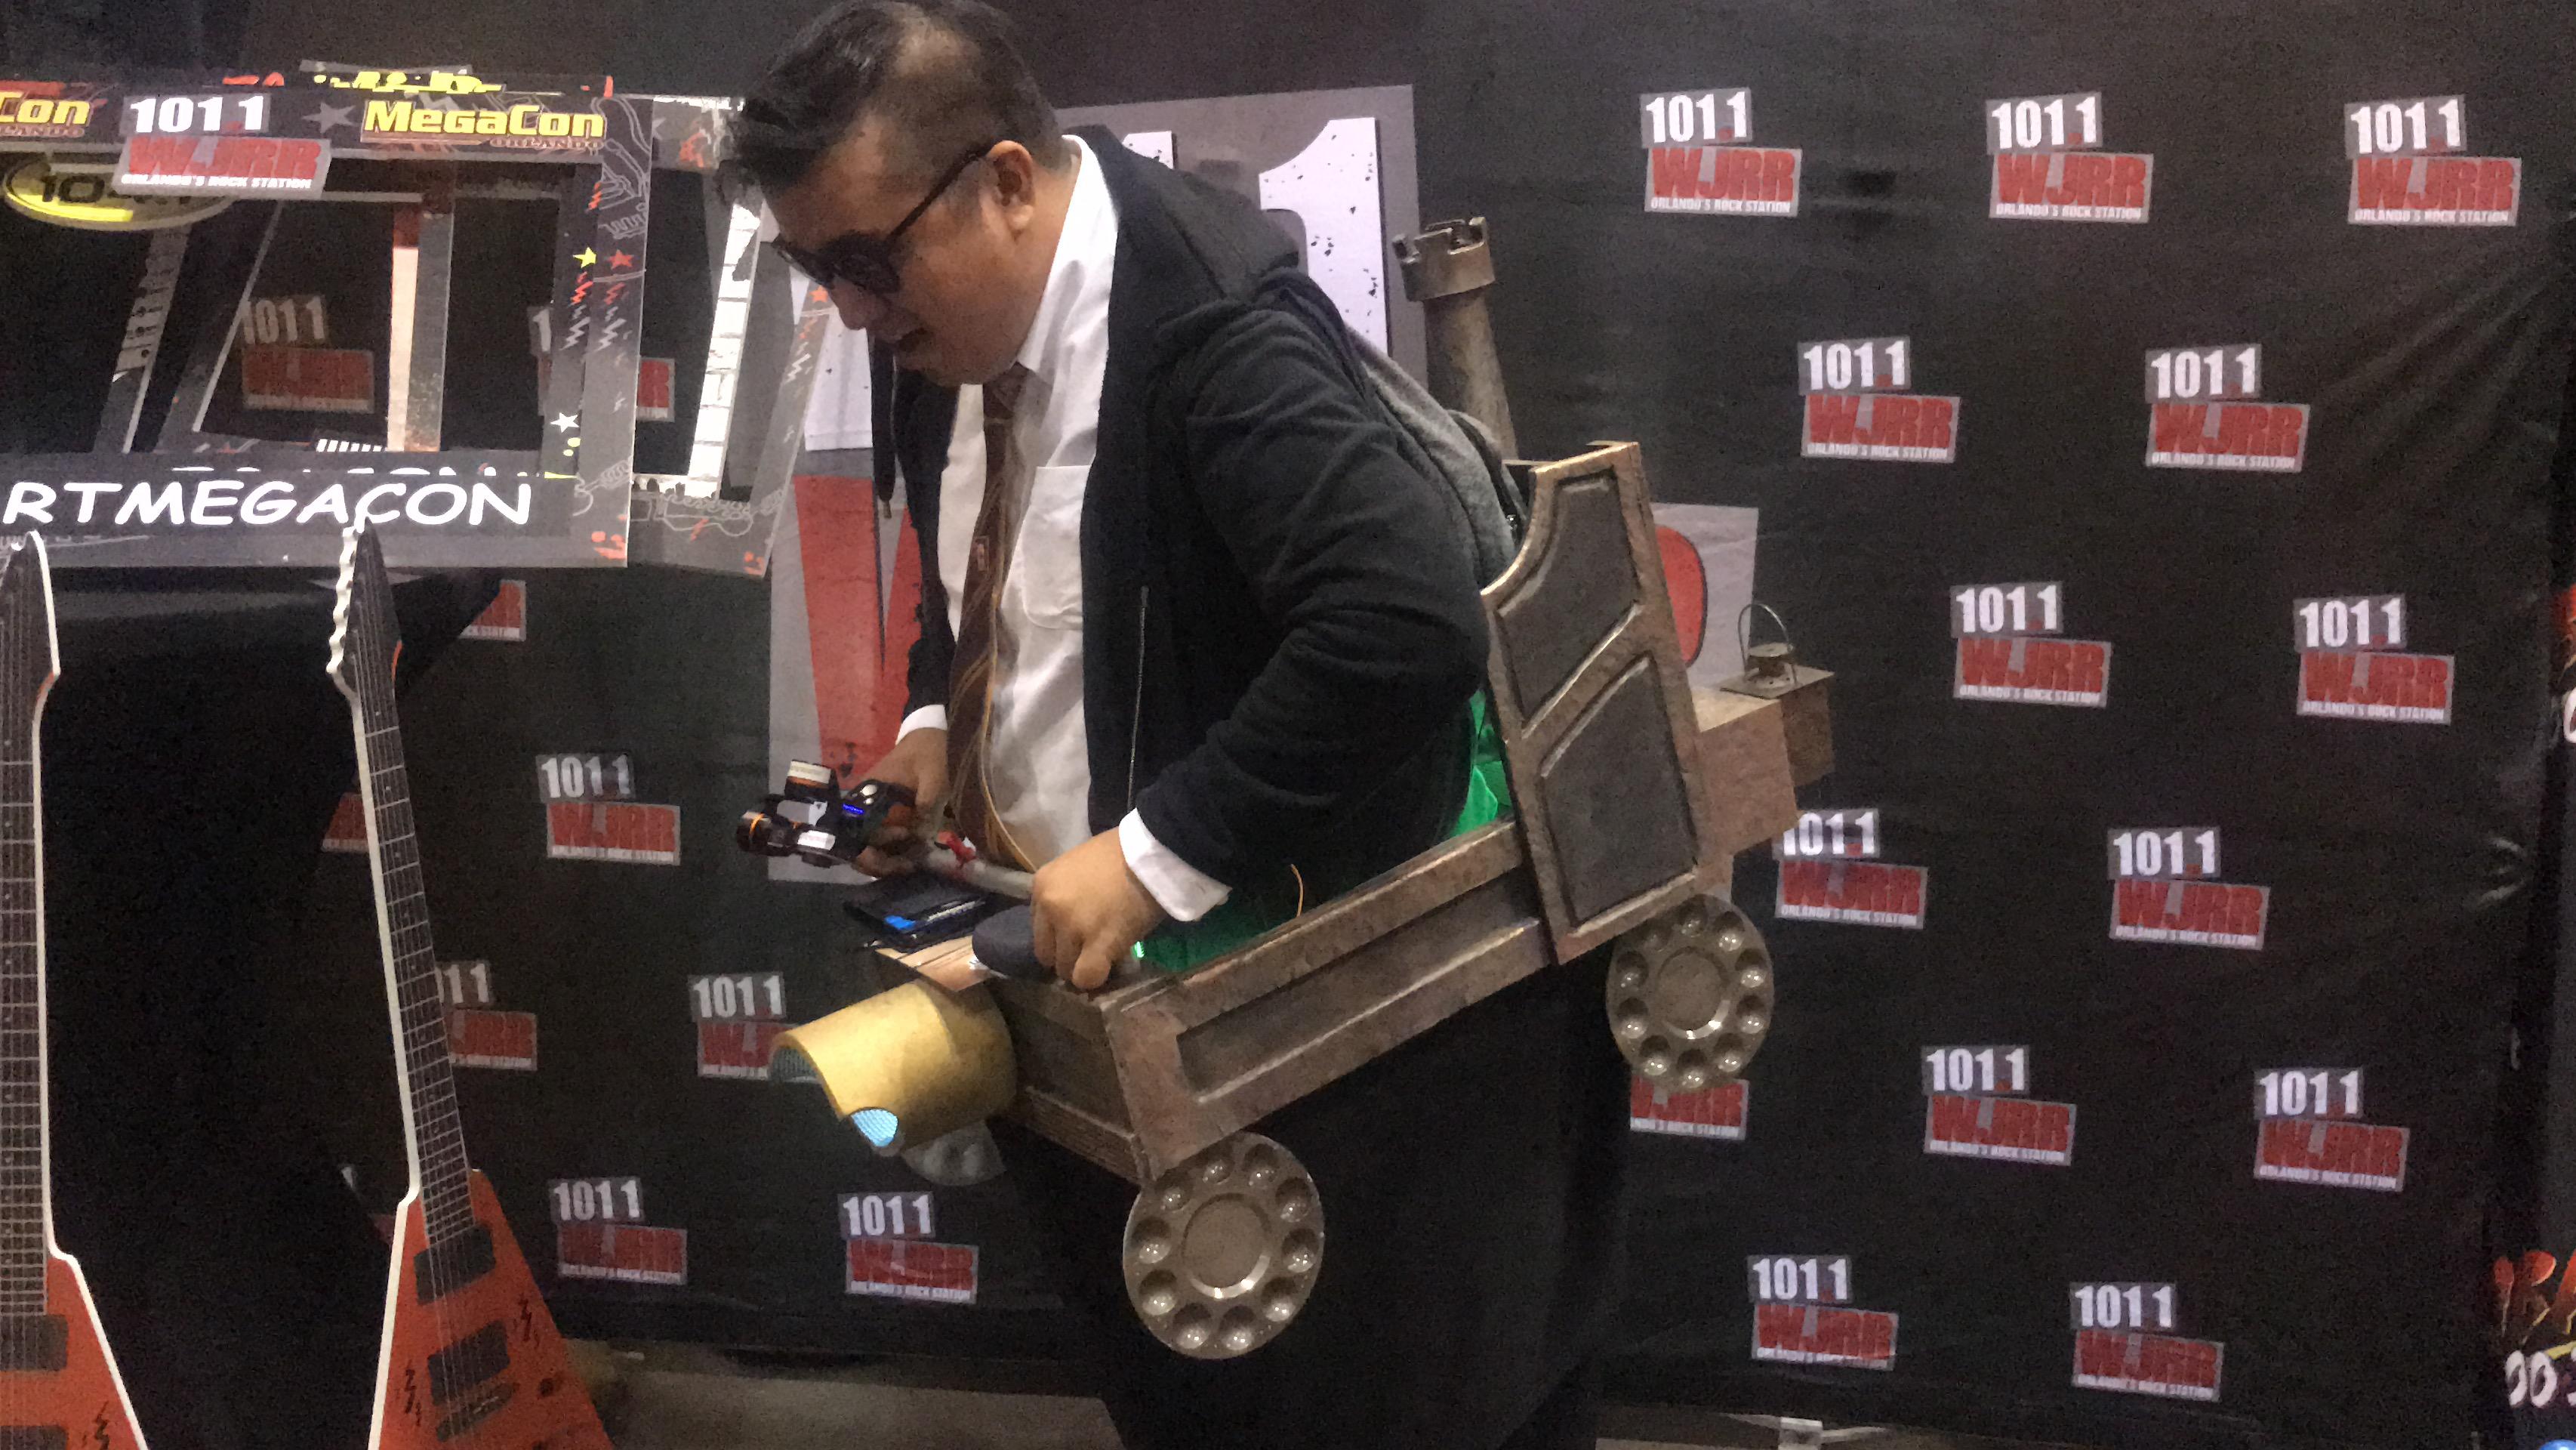 Harry Potter MegaCon cosplay